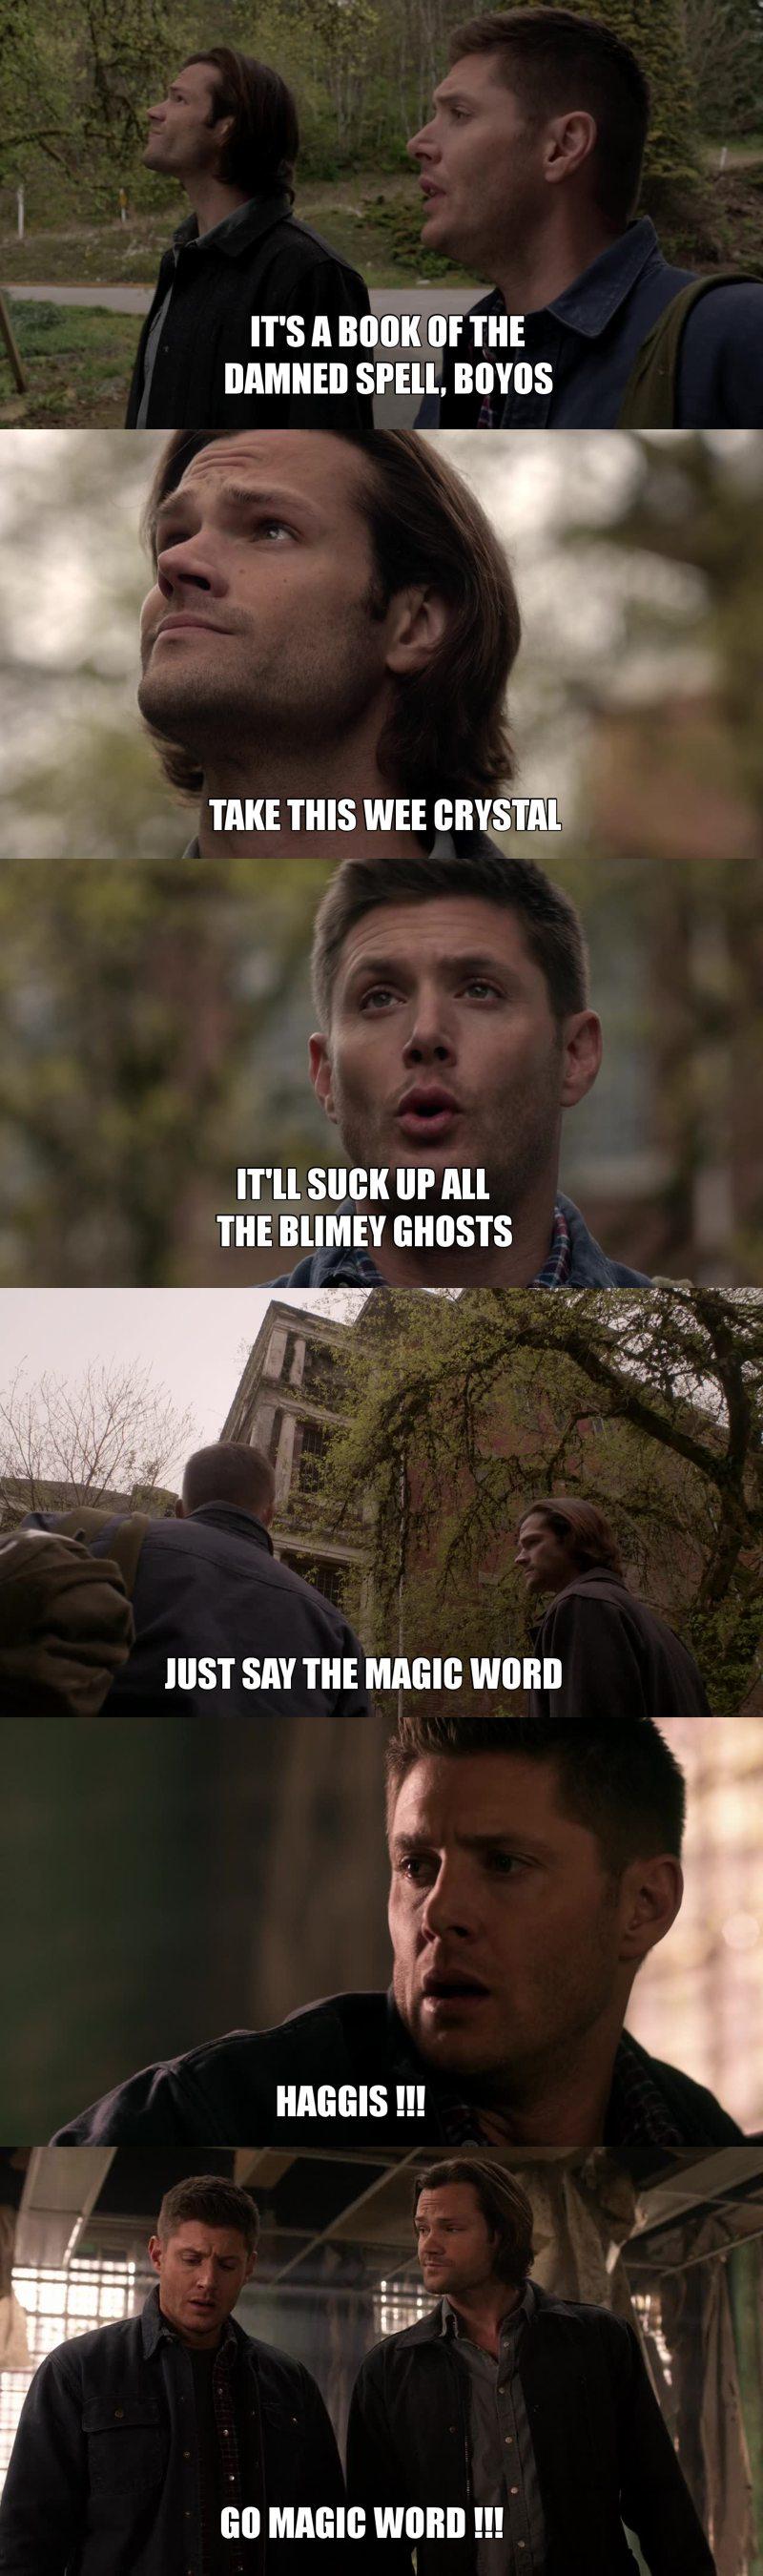 Dean imitating Rowena was hilarious xd